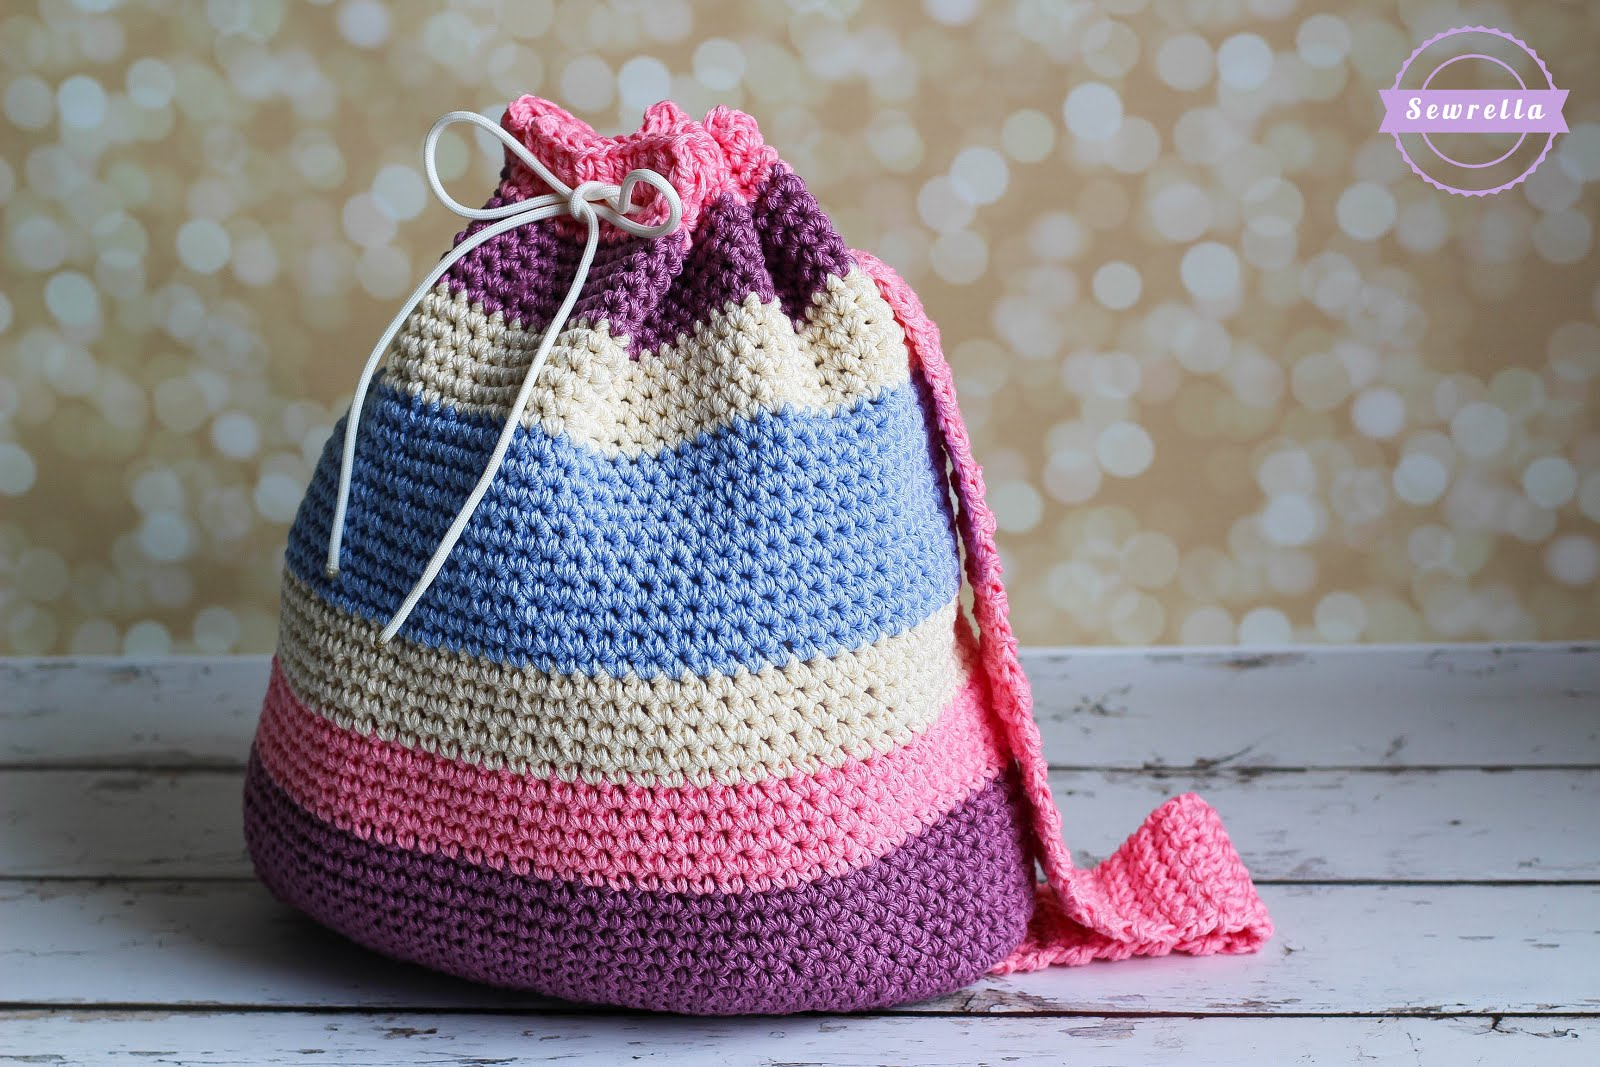 Free Crochet Backpack Tutorial | Crochet backpack, Crochet ... | 1067x1600